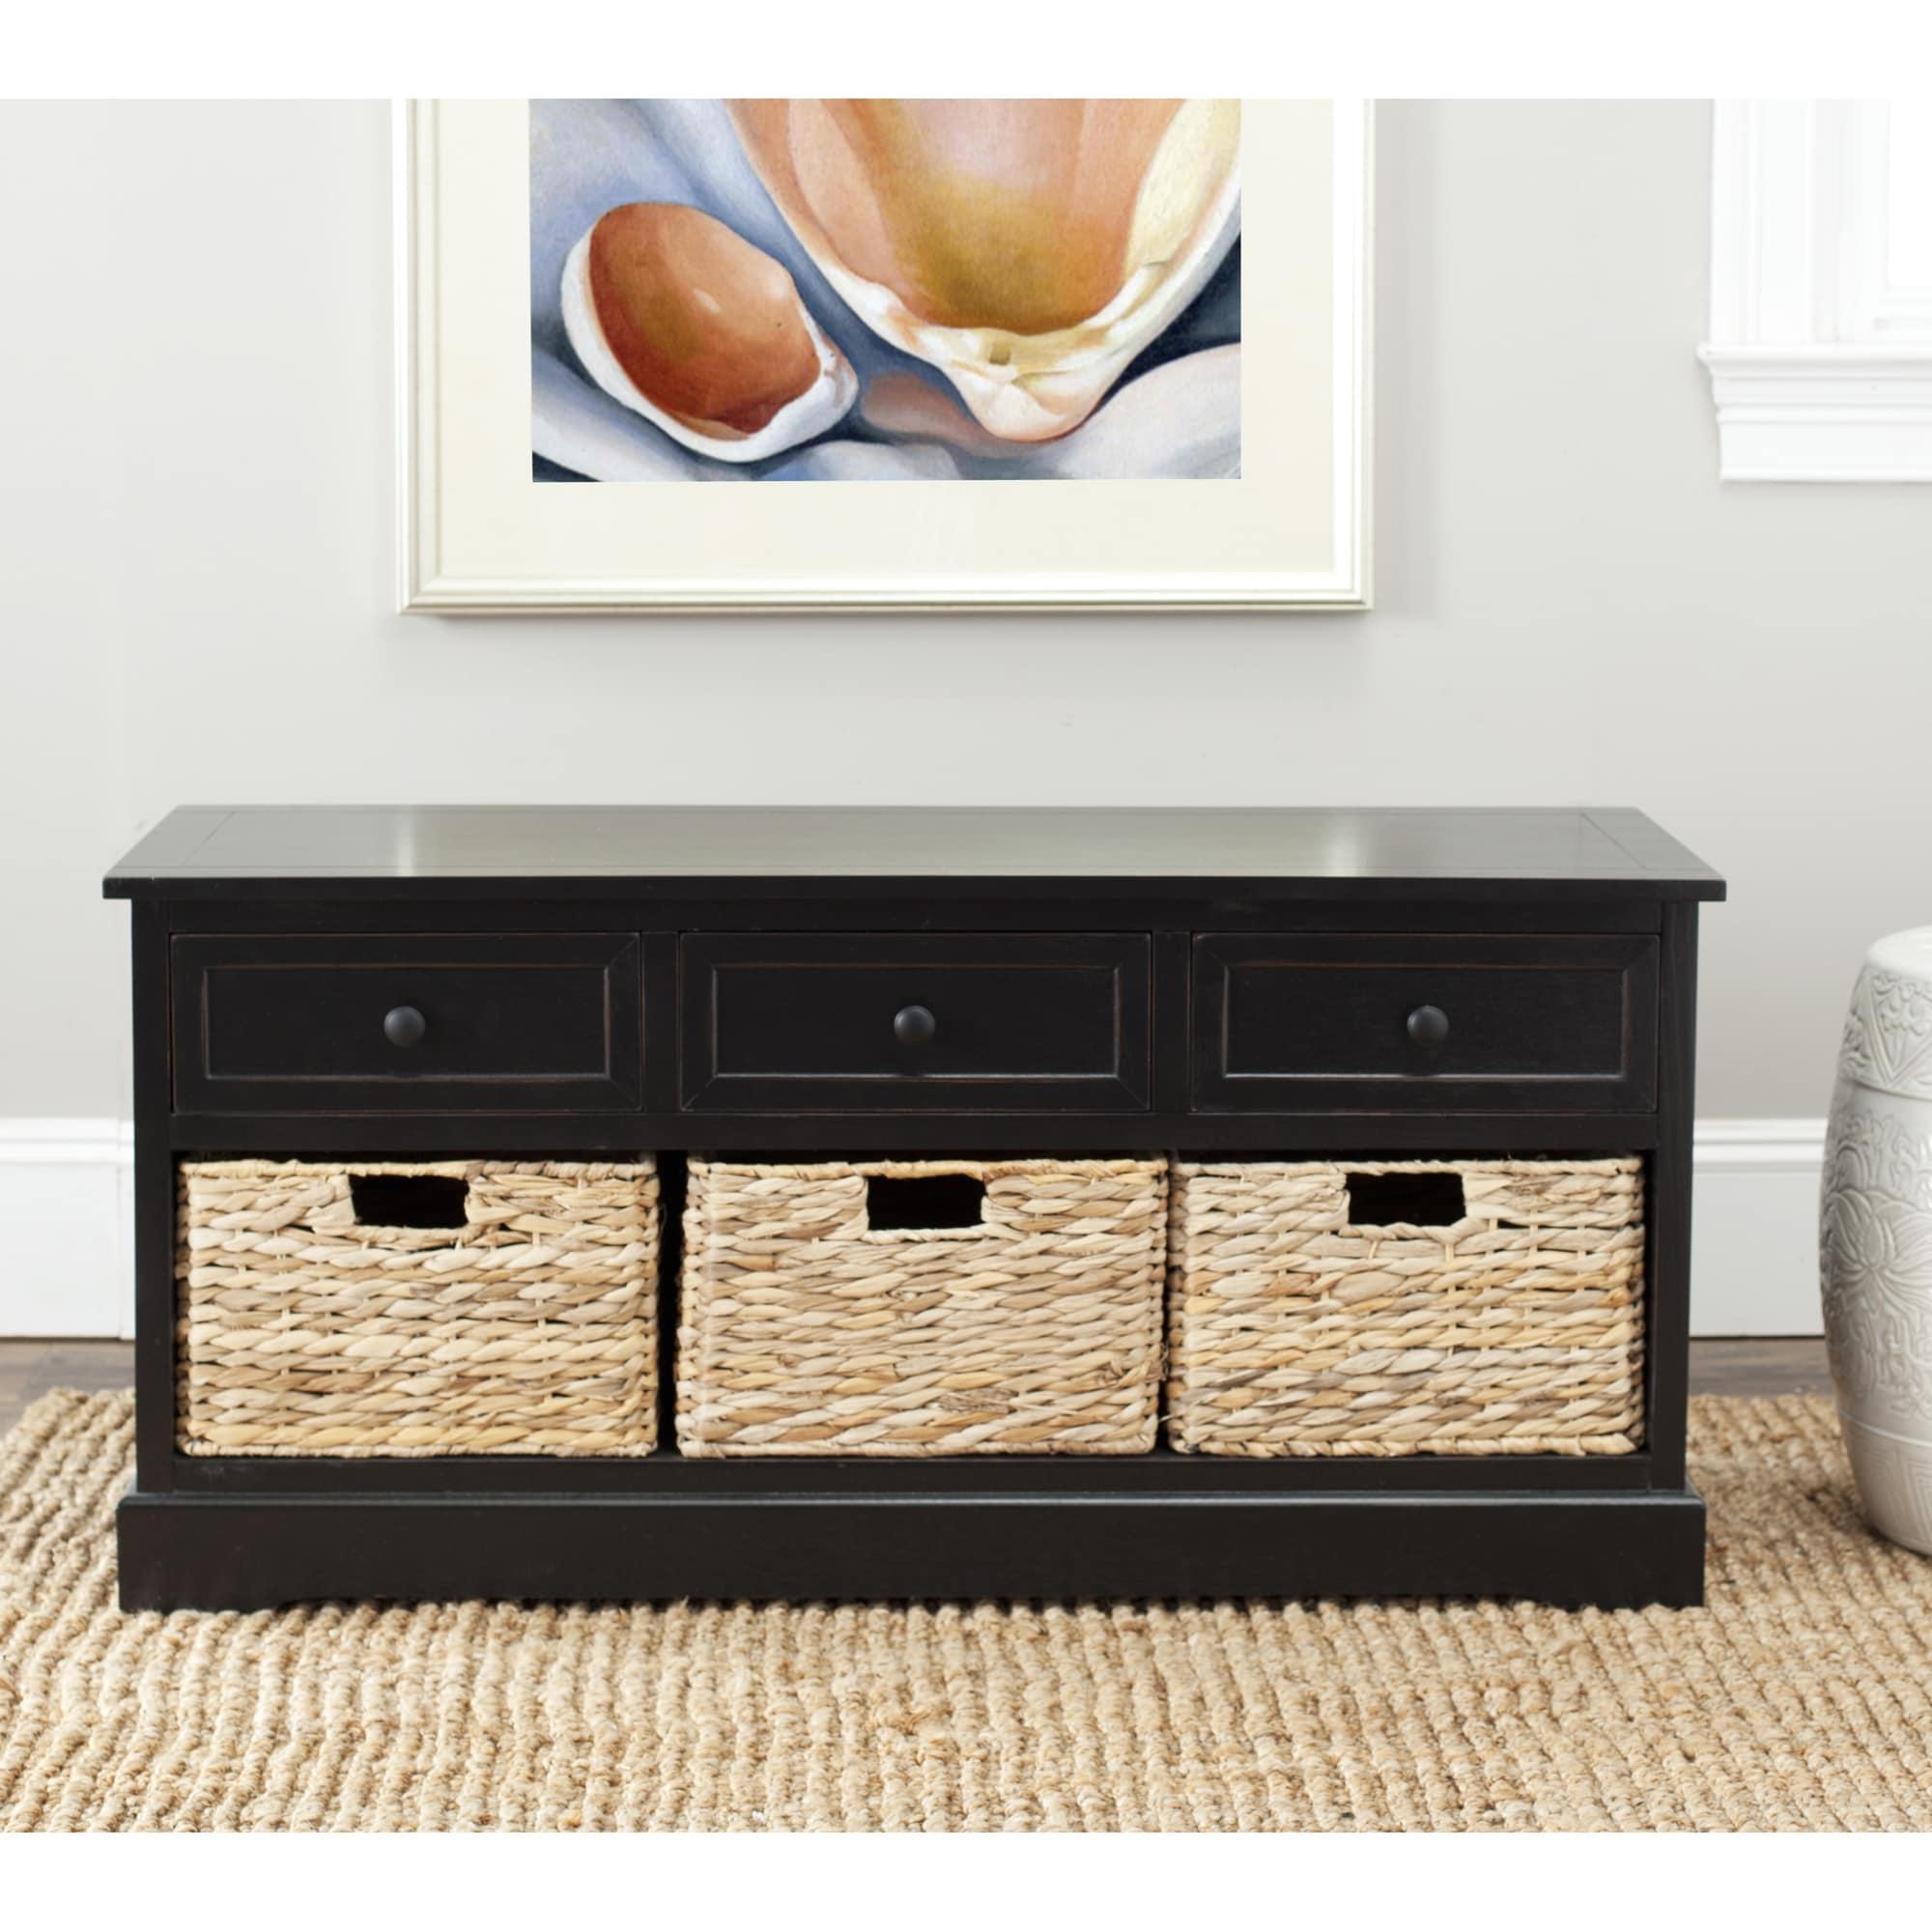 Safavieh Cape Cod Black 3-drawer Storage Unit at Sears.com